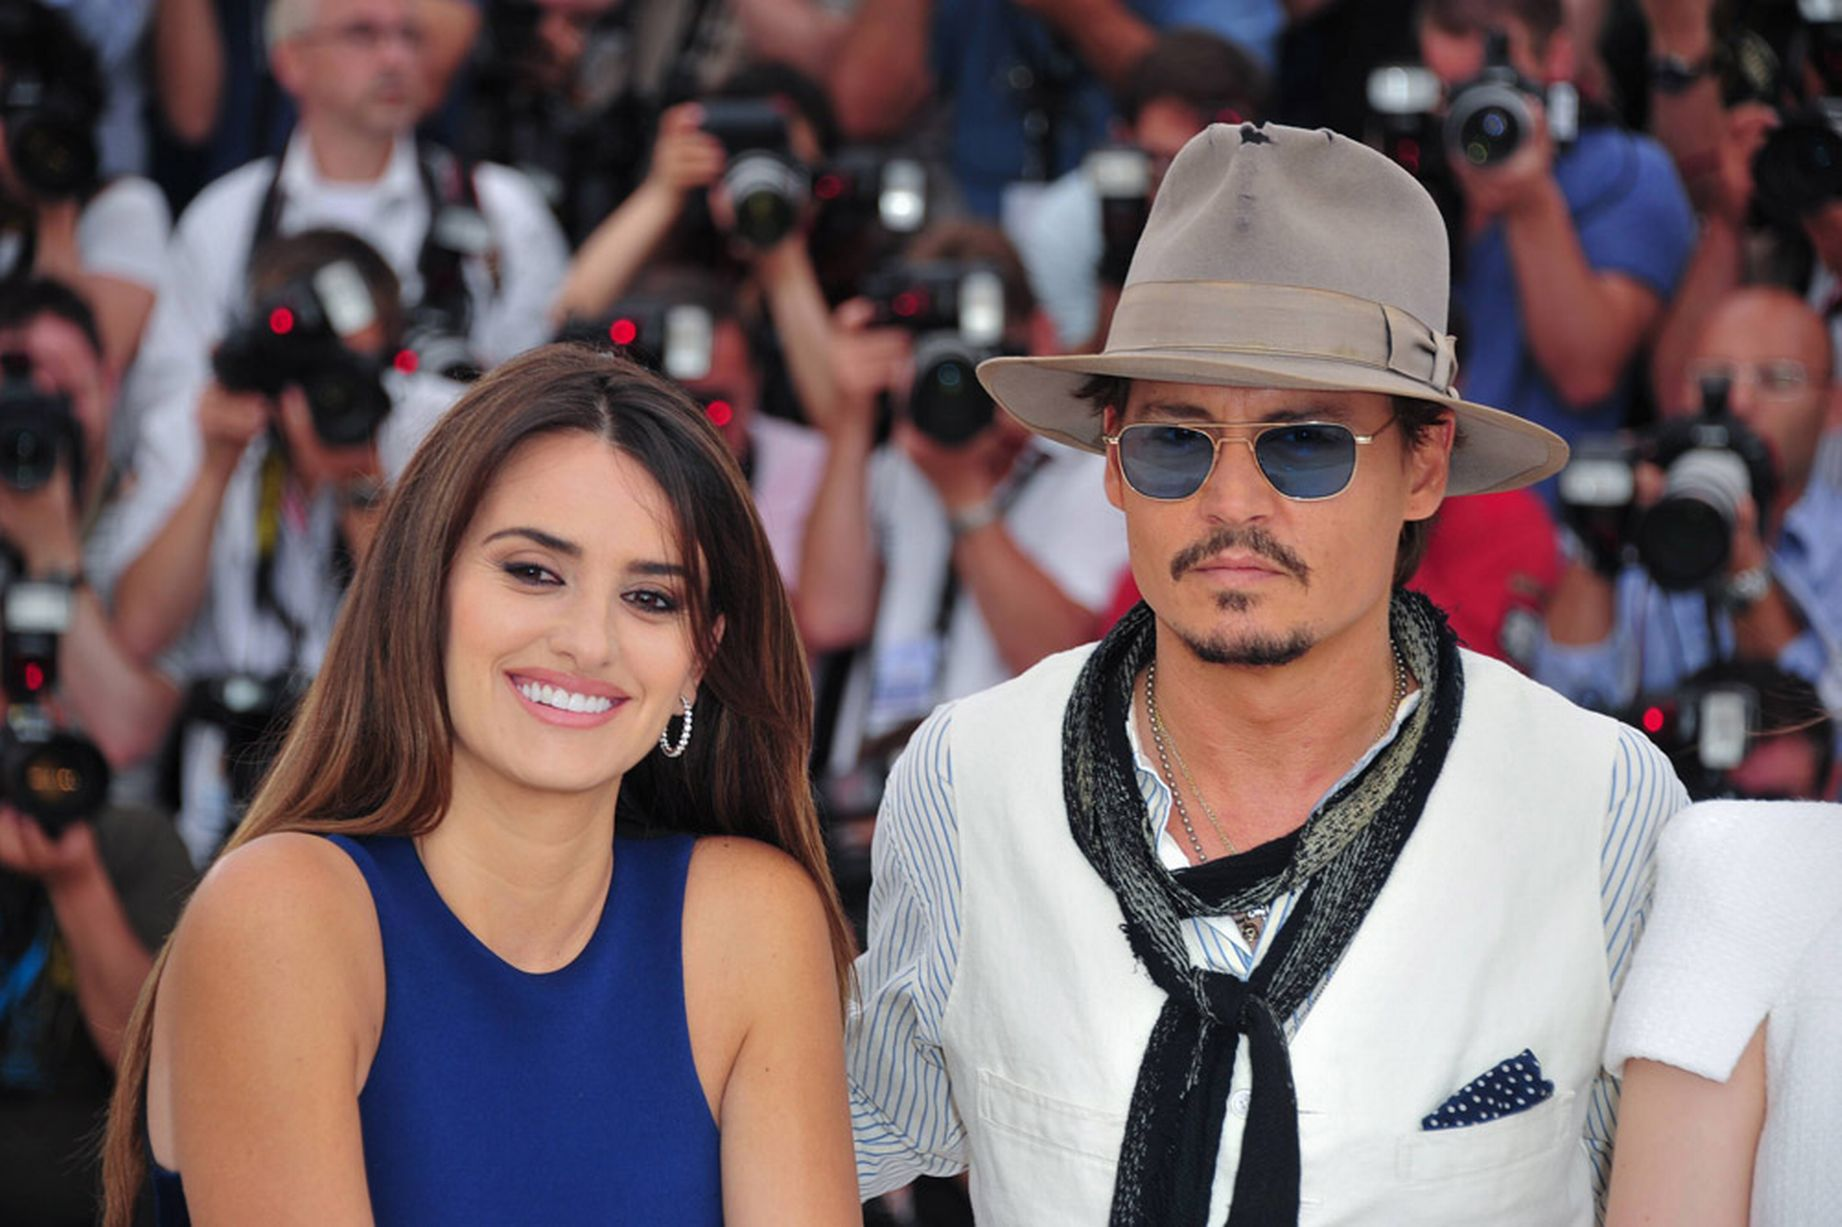 Penelope-Cruz-and-Johnny-Depp-2011